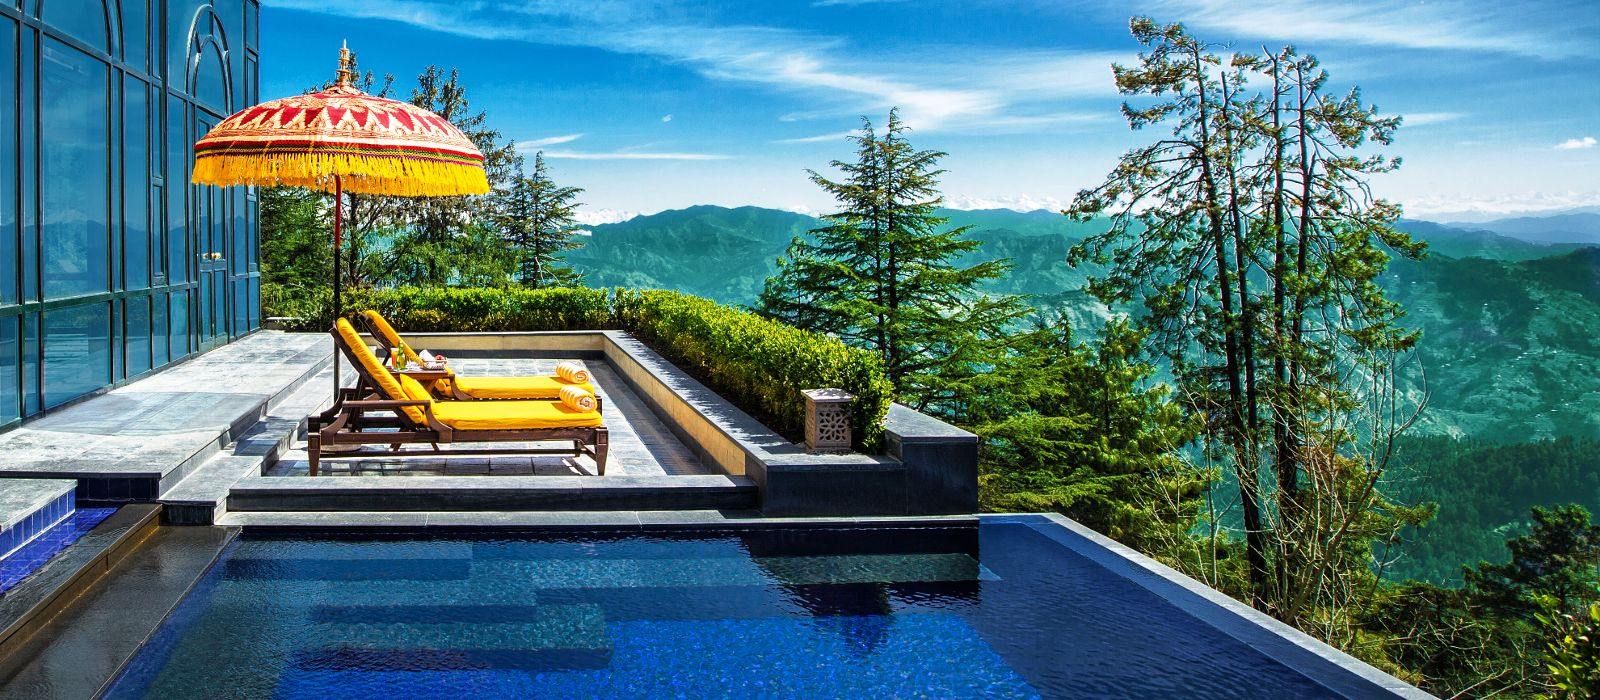 Das The Oberoi Hotels & Resorts Sommerangebot: Im Himalaya Gebirge Urlaub 2